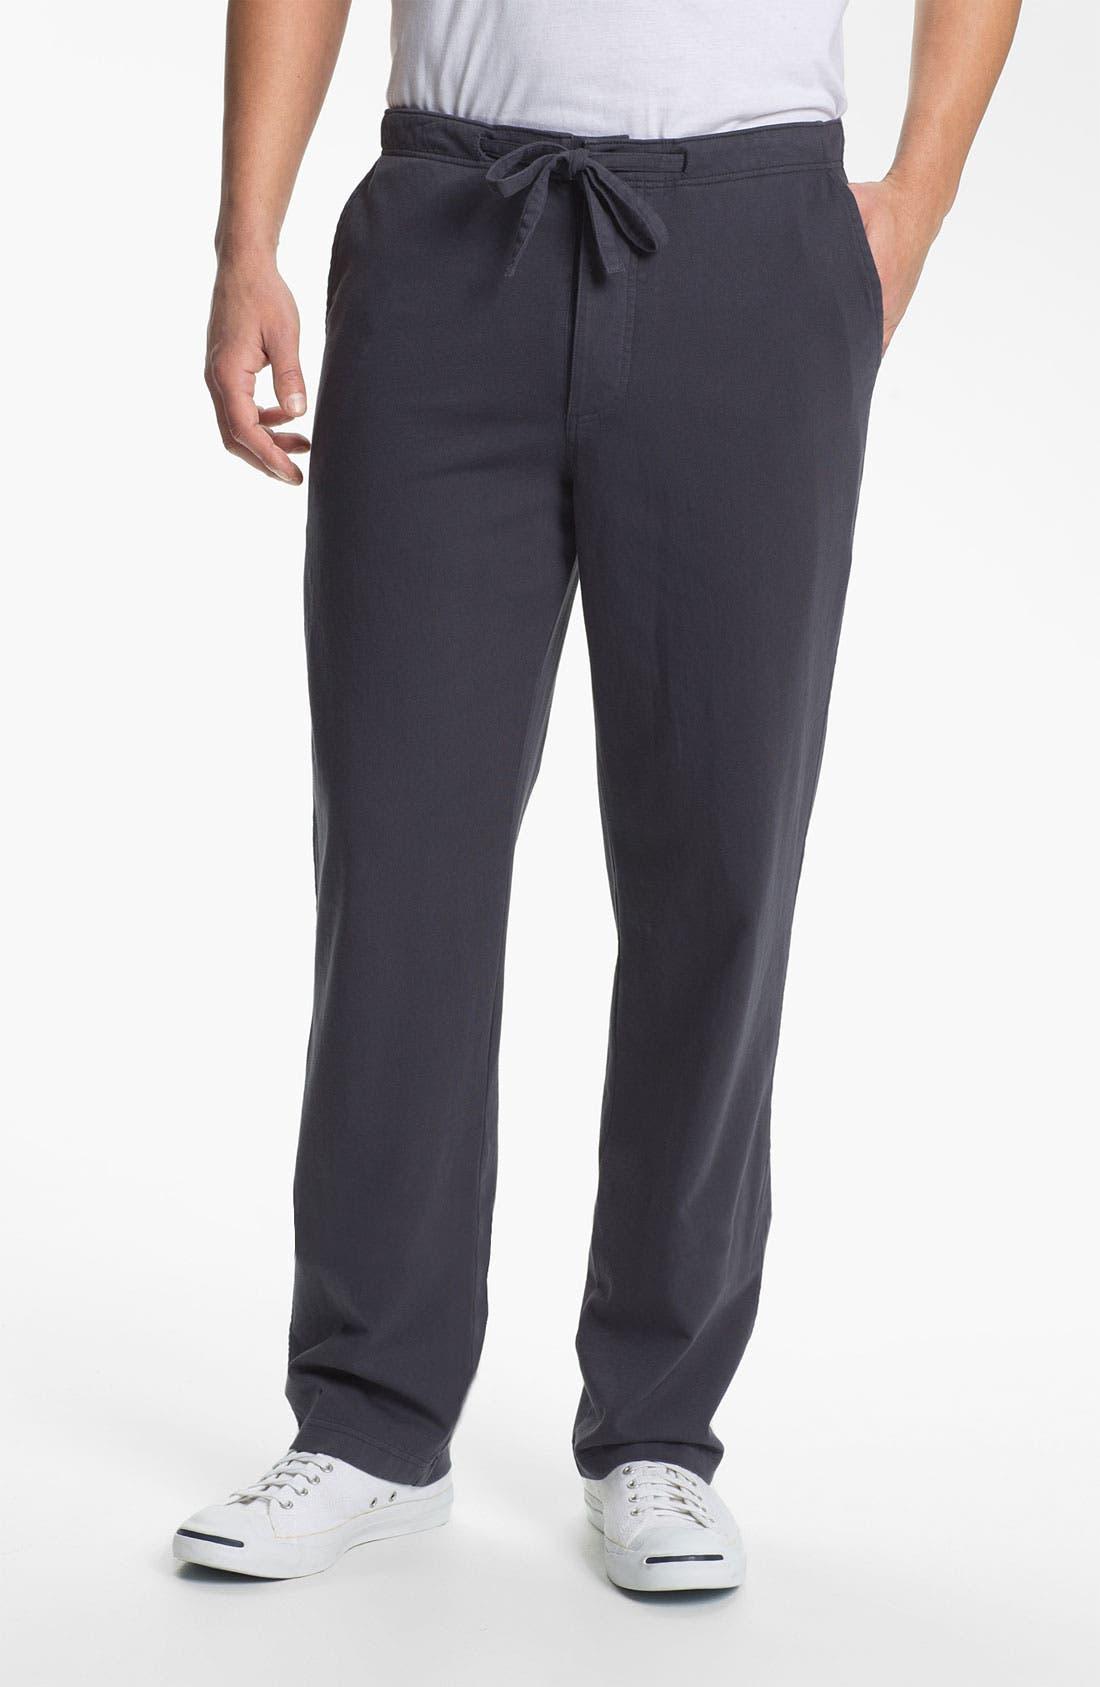 Alternate Image 1 Selected - Grayers 'Cayman Beach' Flat Front Pants